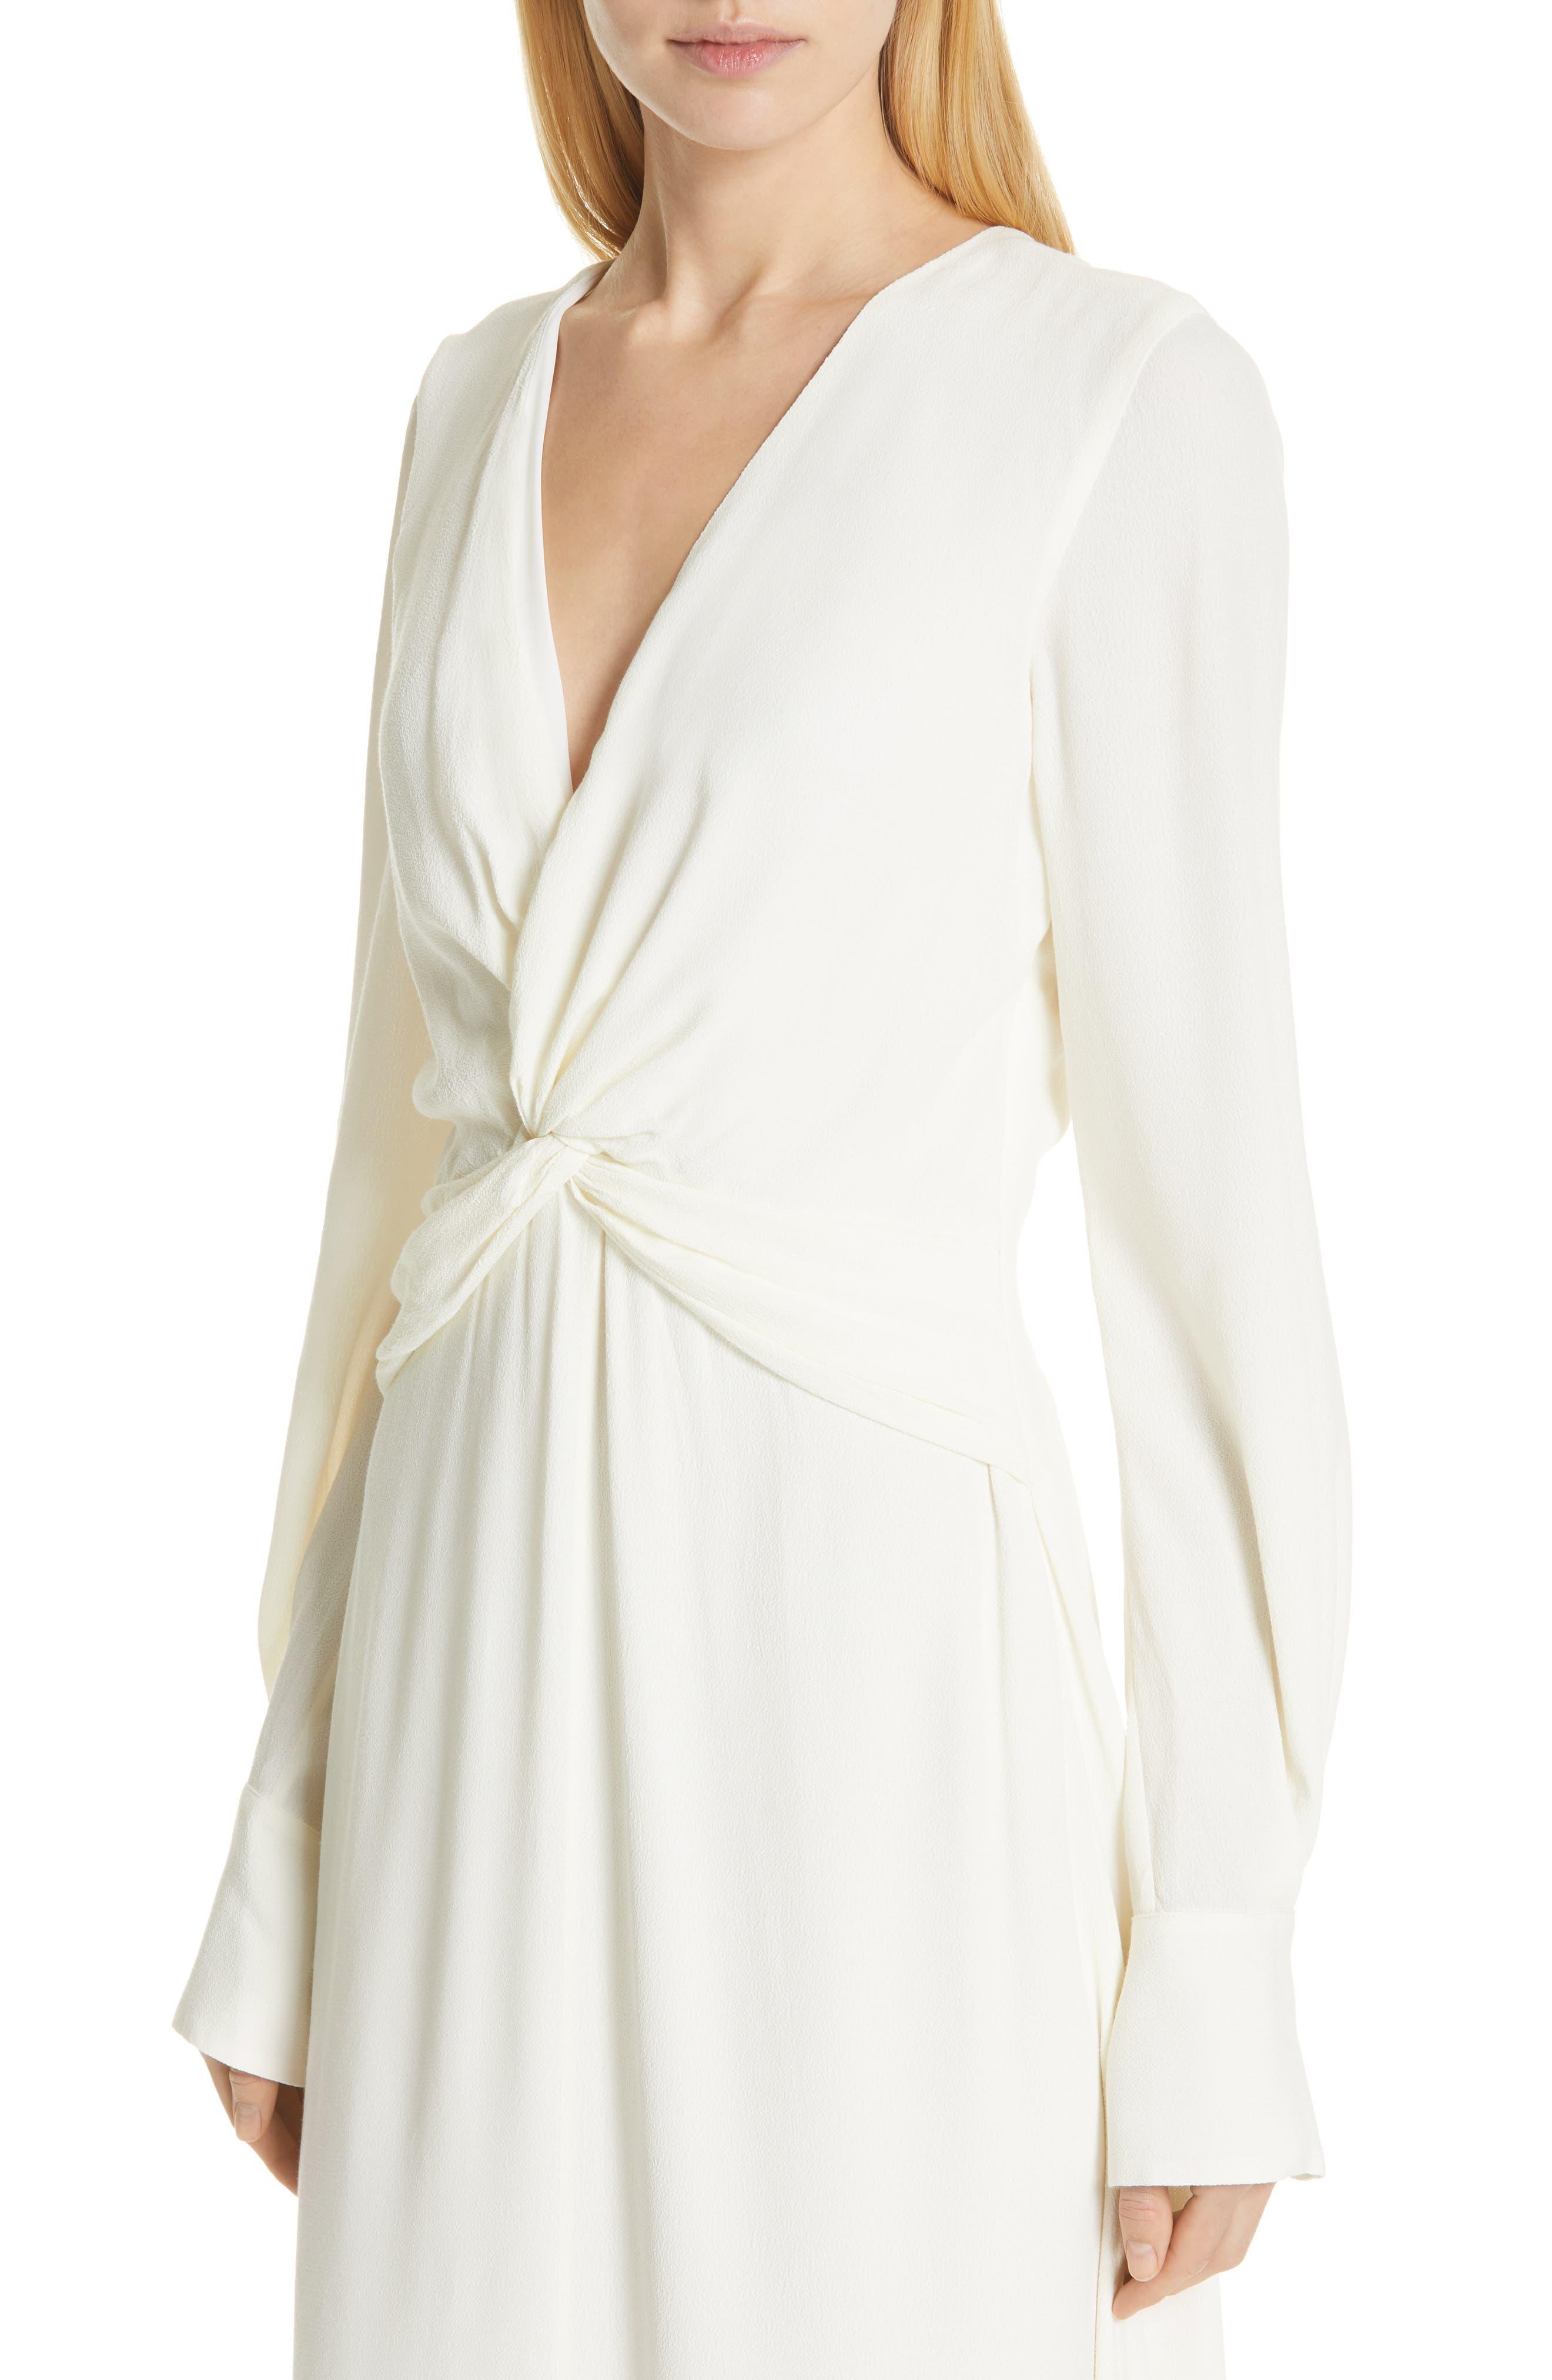 EQUIPMENT, Faun Twist Front Dress, Alternate thumbnail 4, color, NATURE WHITE